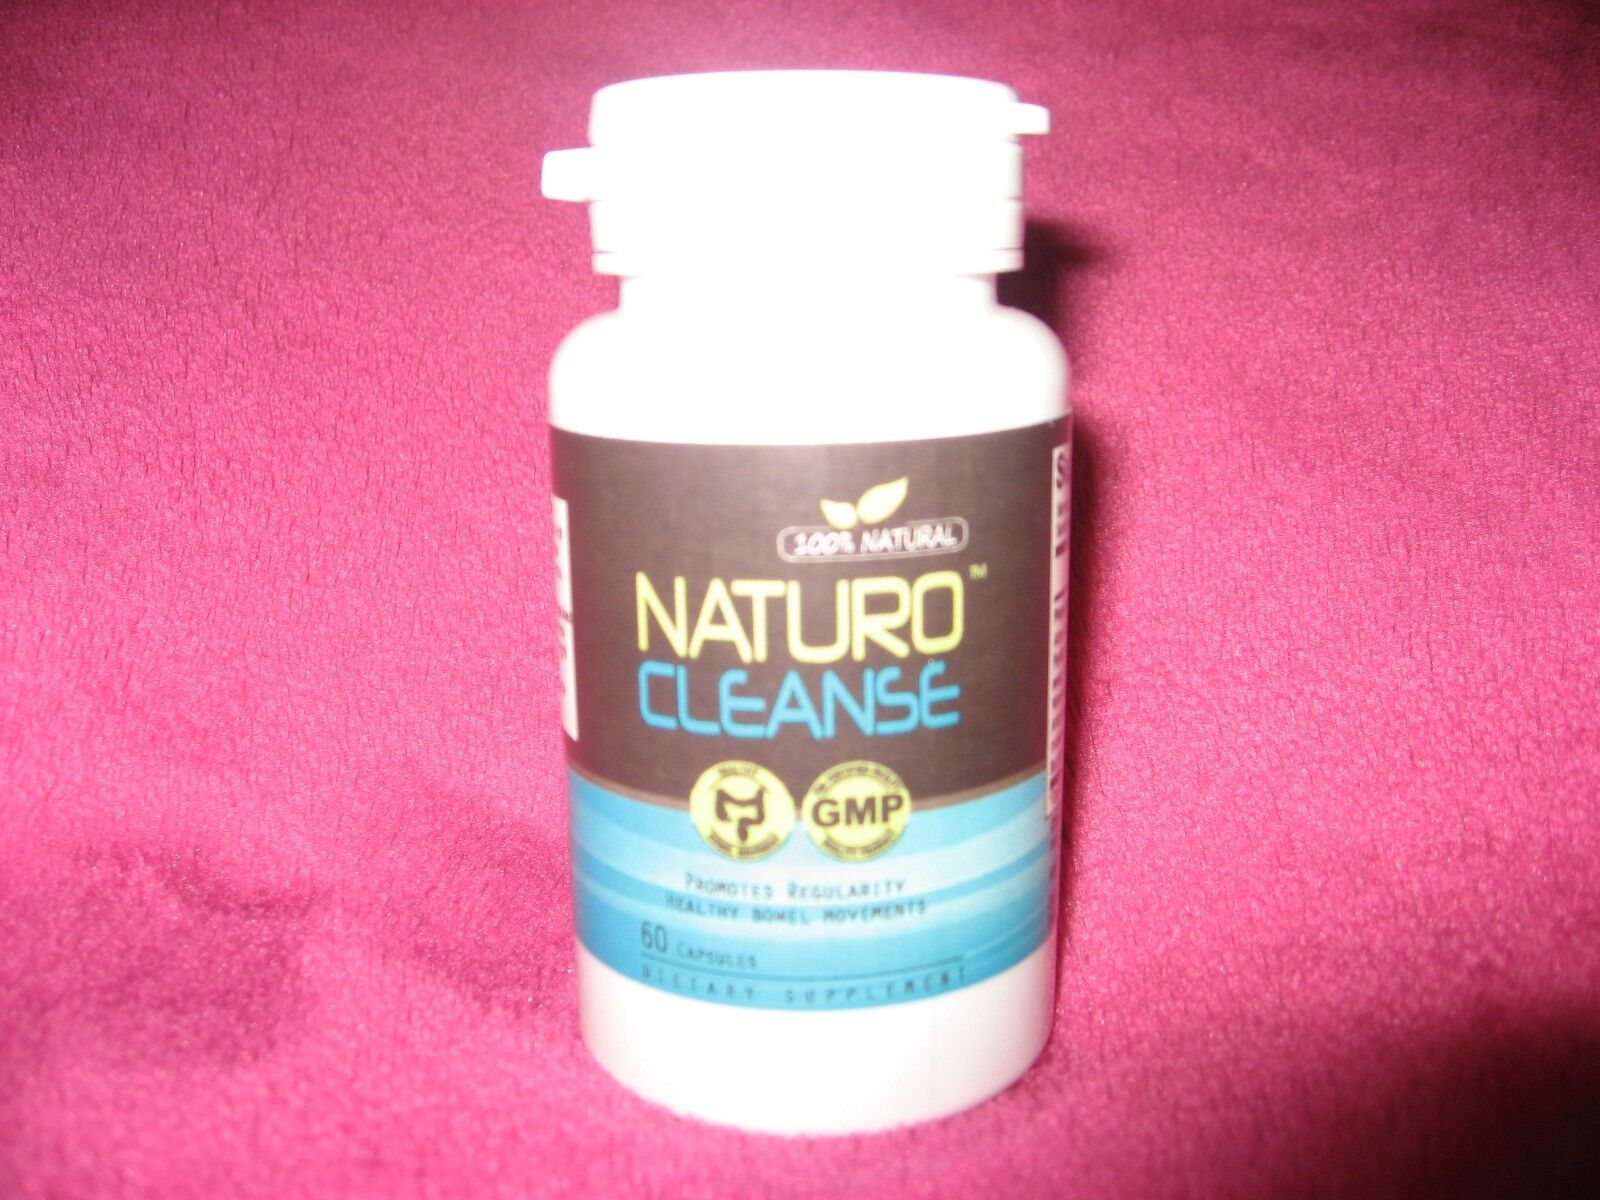 Naturo Cleanse- NEU - starkes Mittel zum Abnehmen, 60 Kapseln, 100% Natural